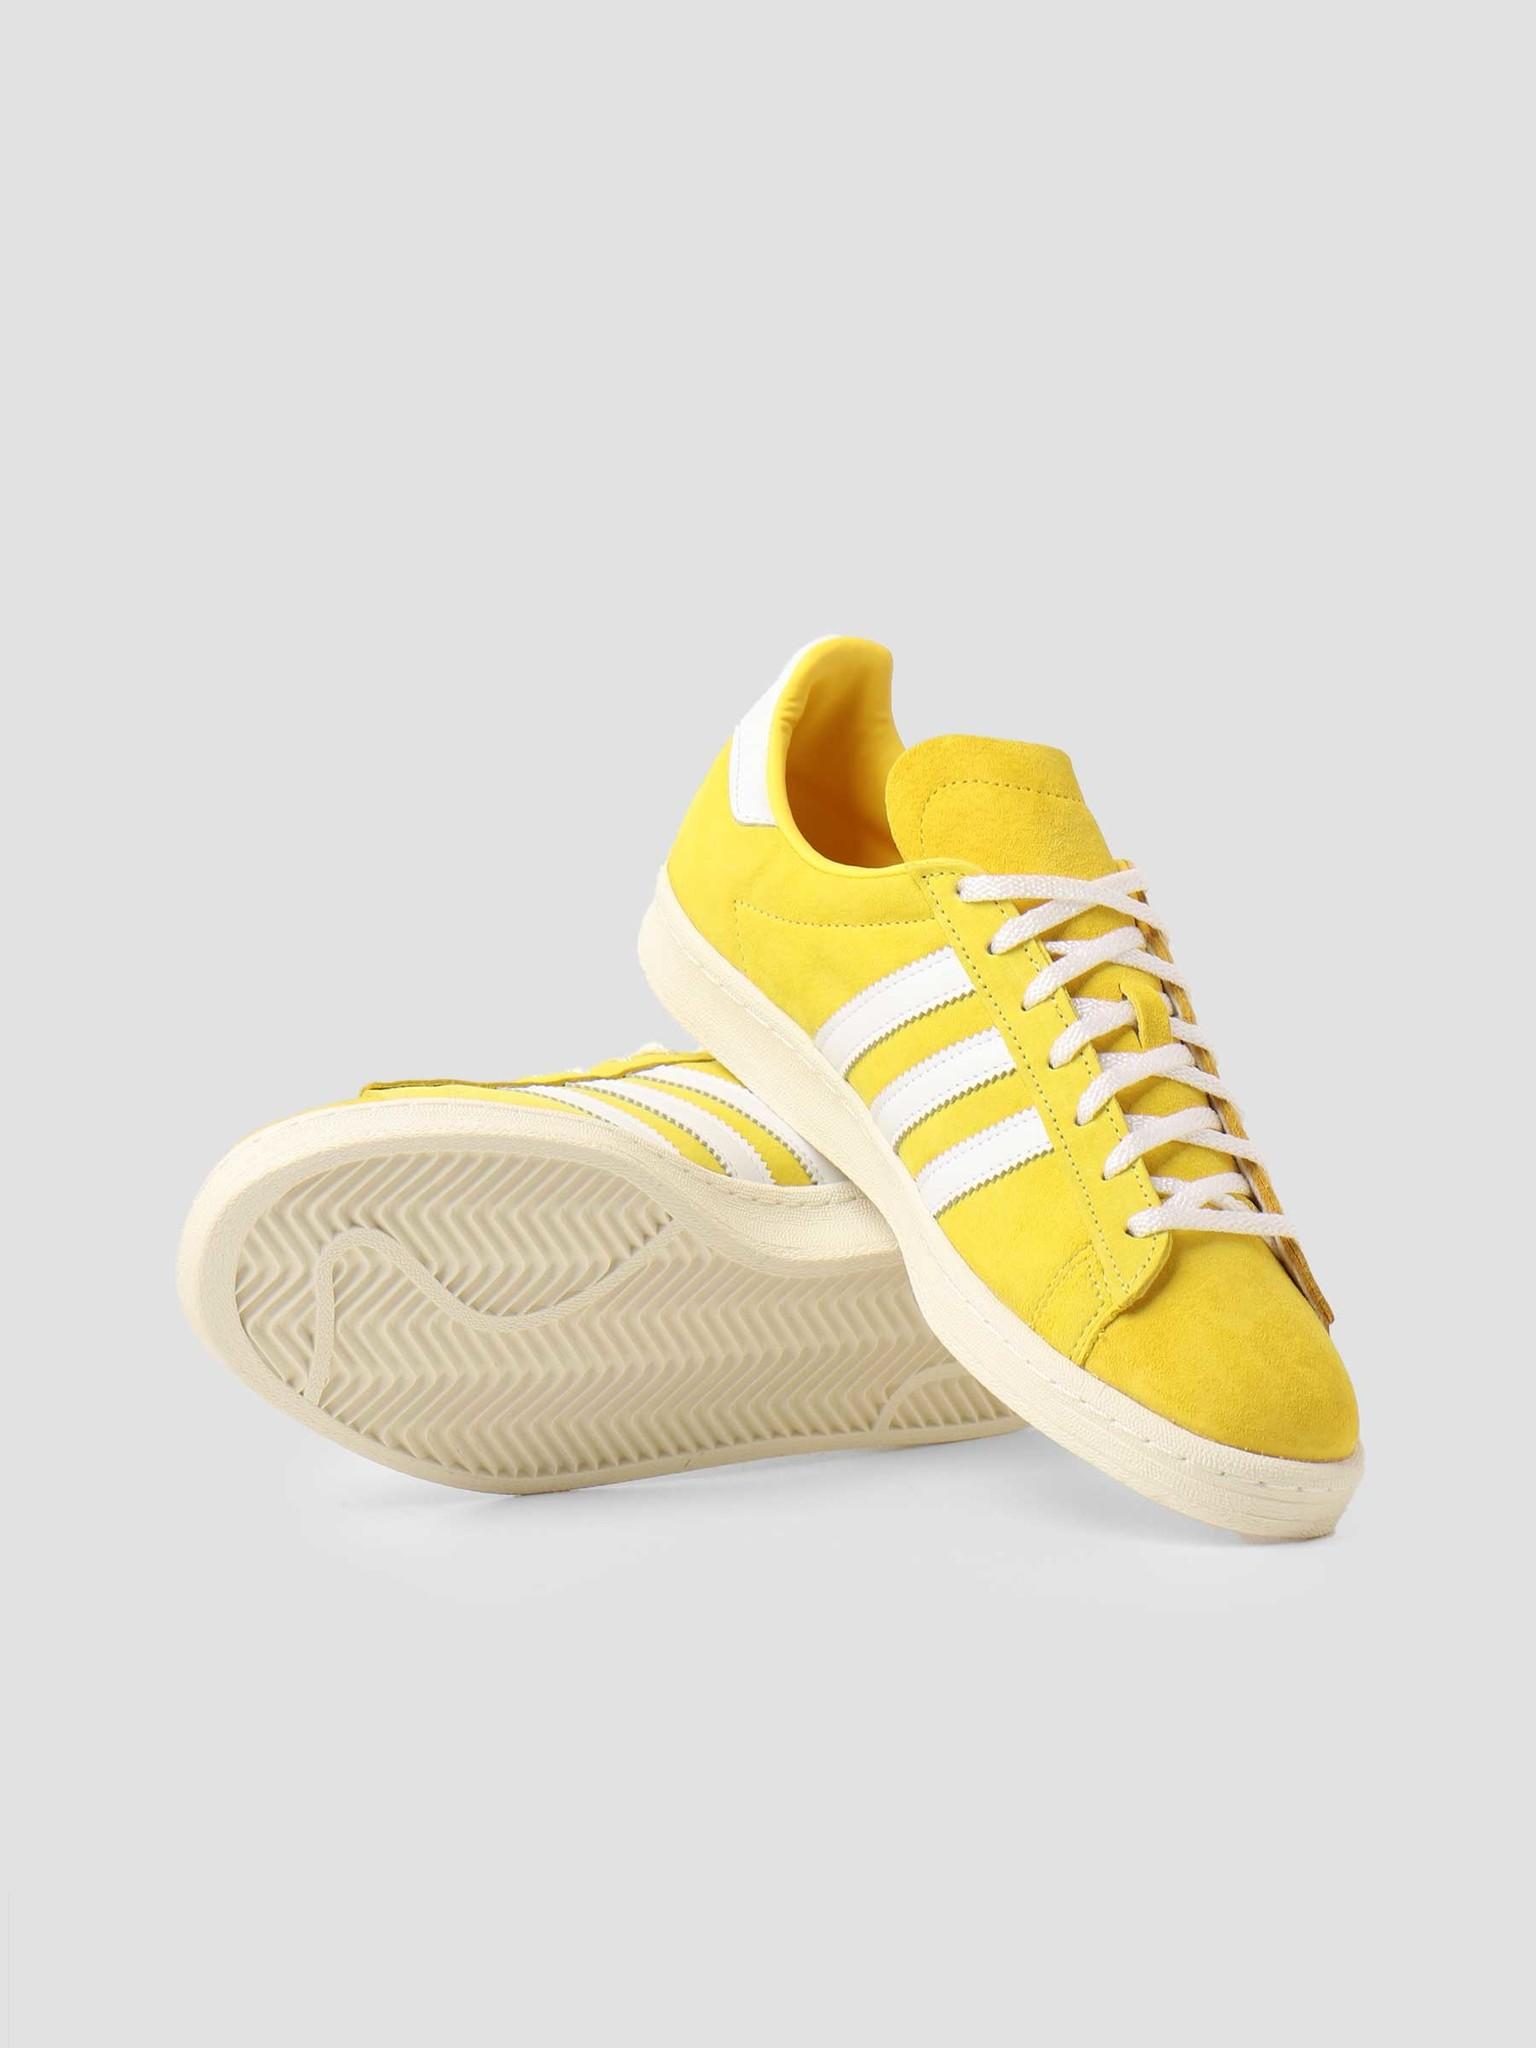 adidas adidas Campus 80S Yellow Gold FX5443